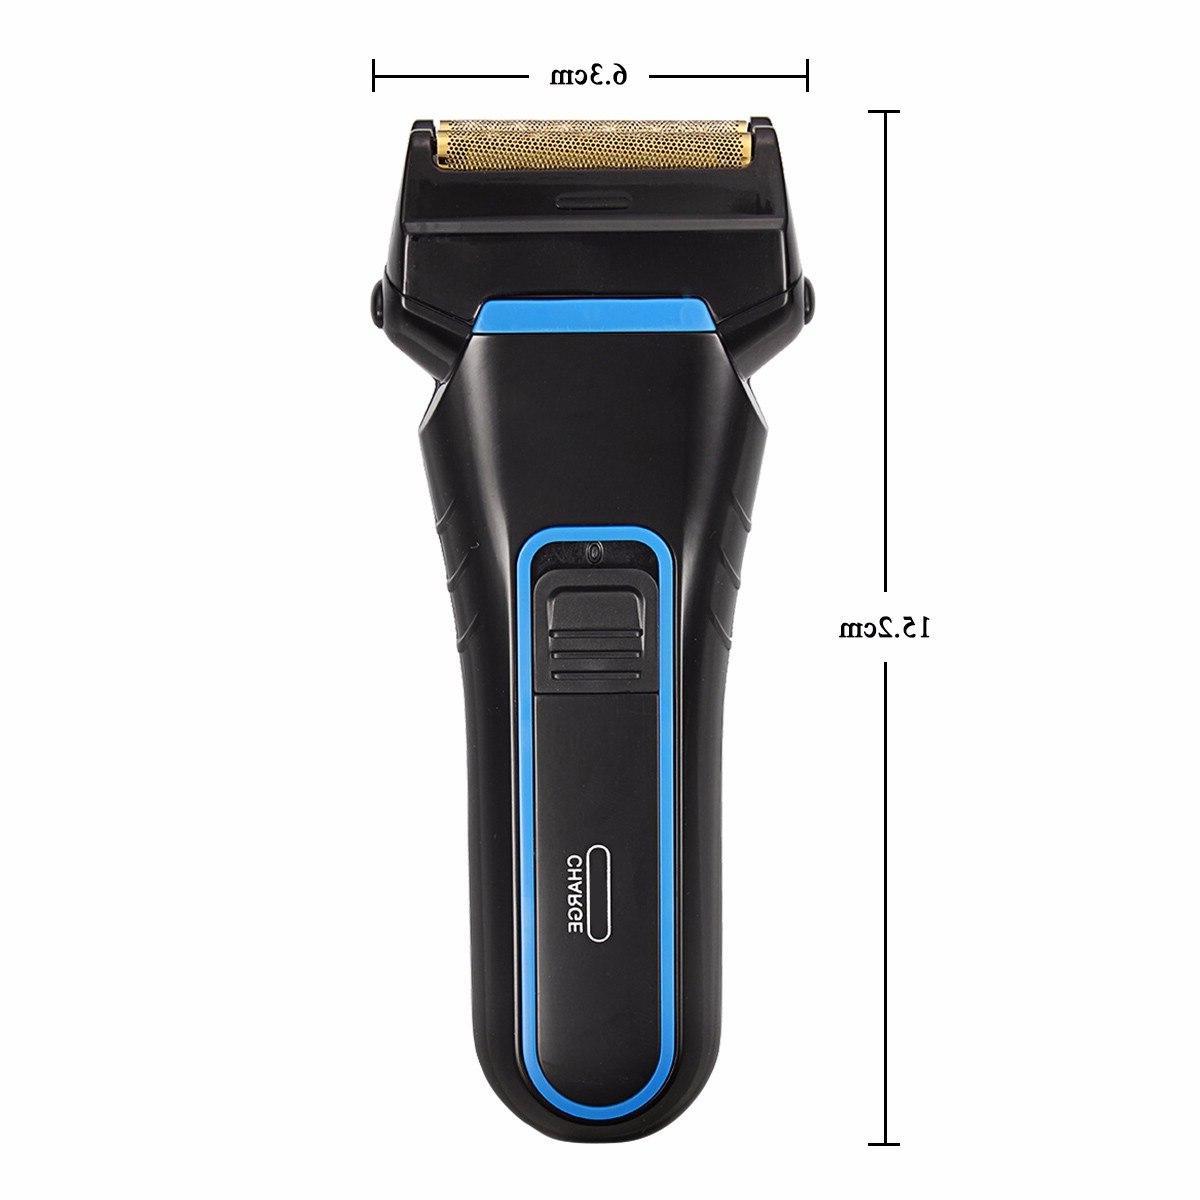 Kemei Men <font><b>Shaver</b></font> Blades Cordless Dual <font><b>Foil</b></font> Rechargeable Beard